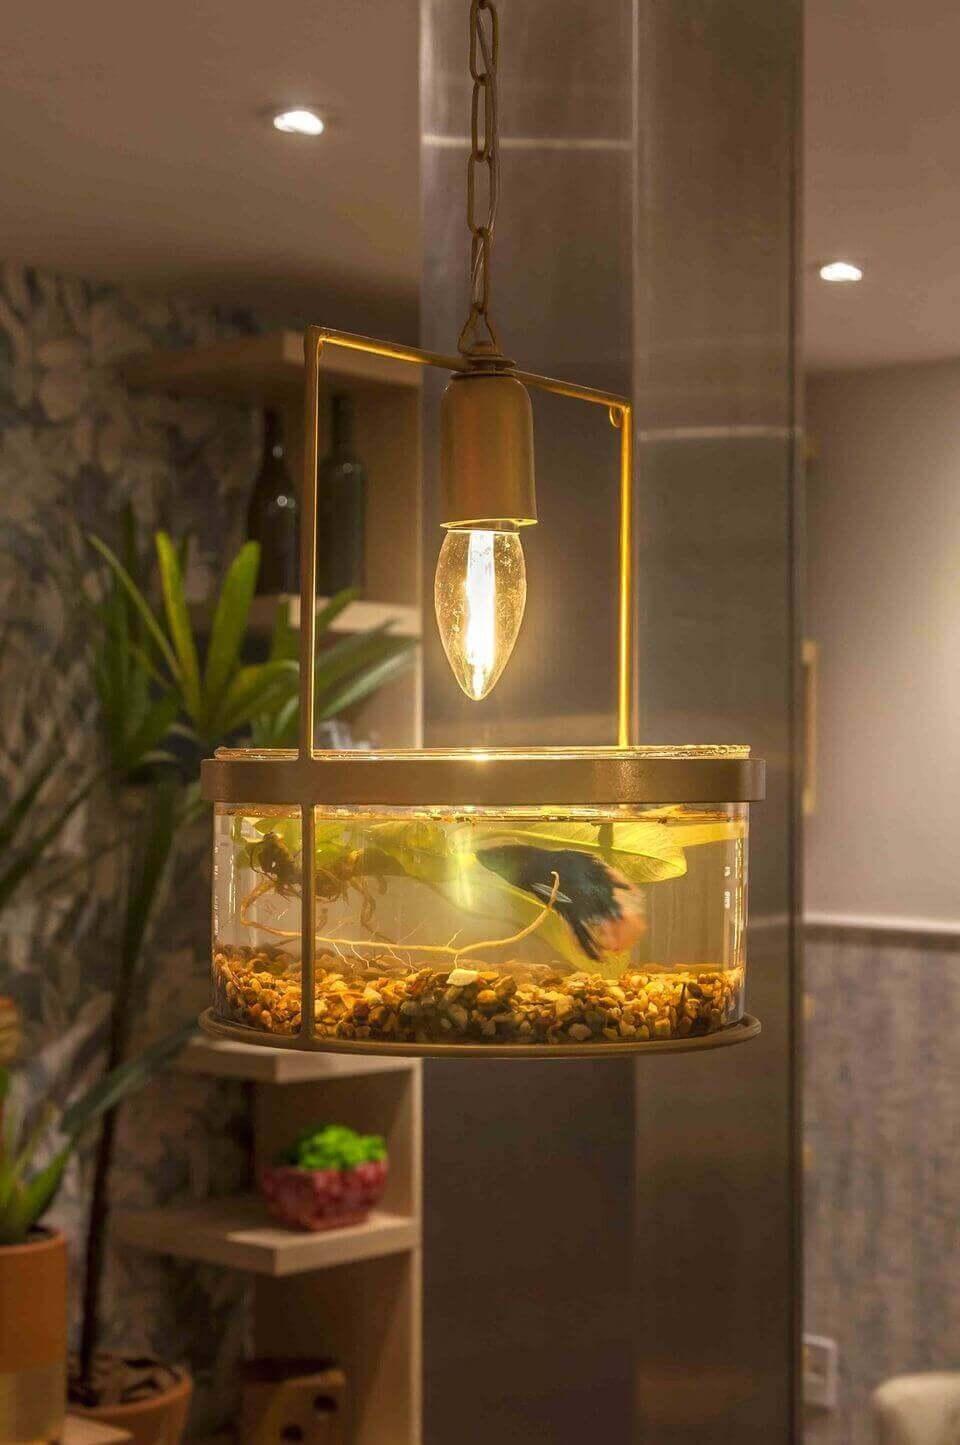 tipos de lâmpadas - pendente de lâmpada